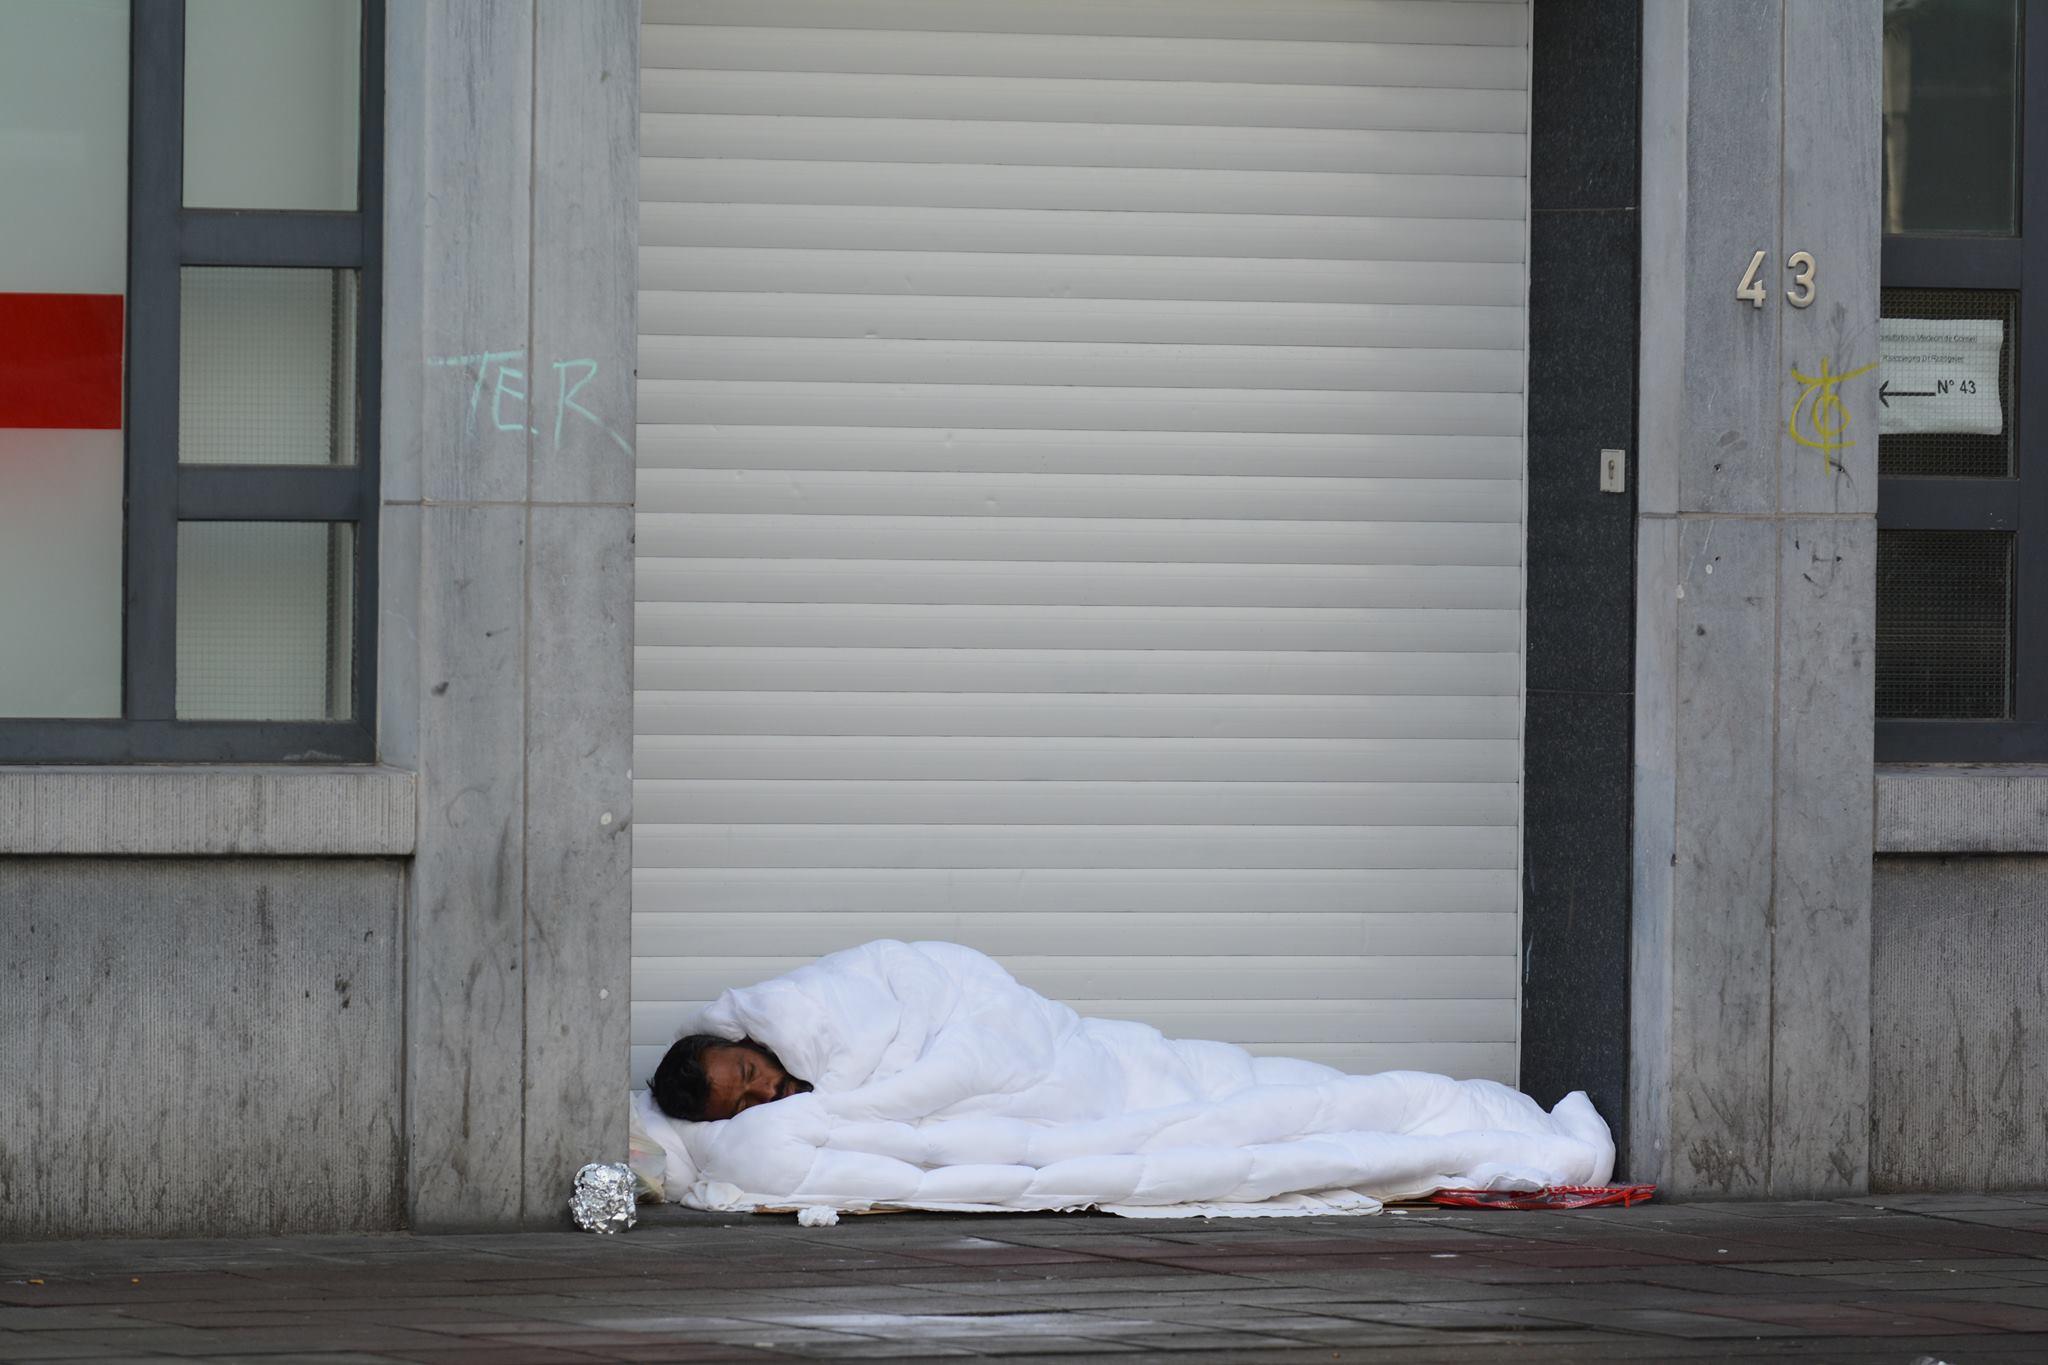 """Armoede is geen individuele keuze, maar resultaat van asociaal beleid"""